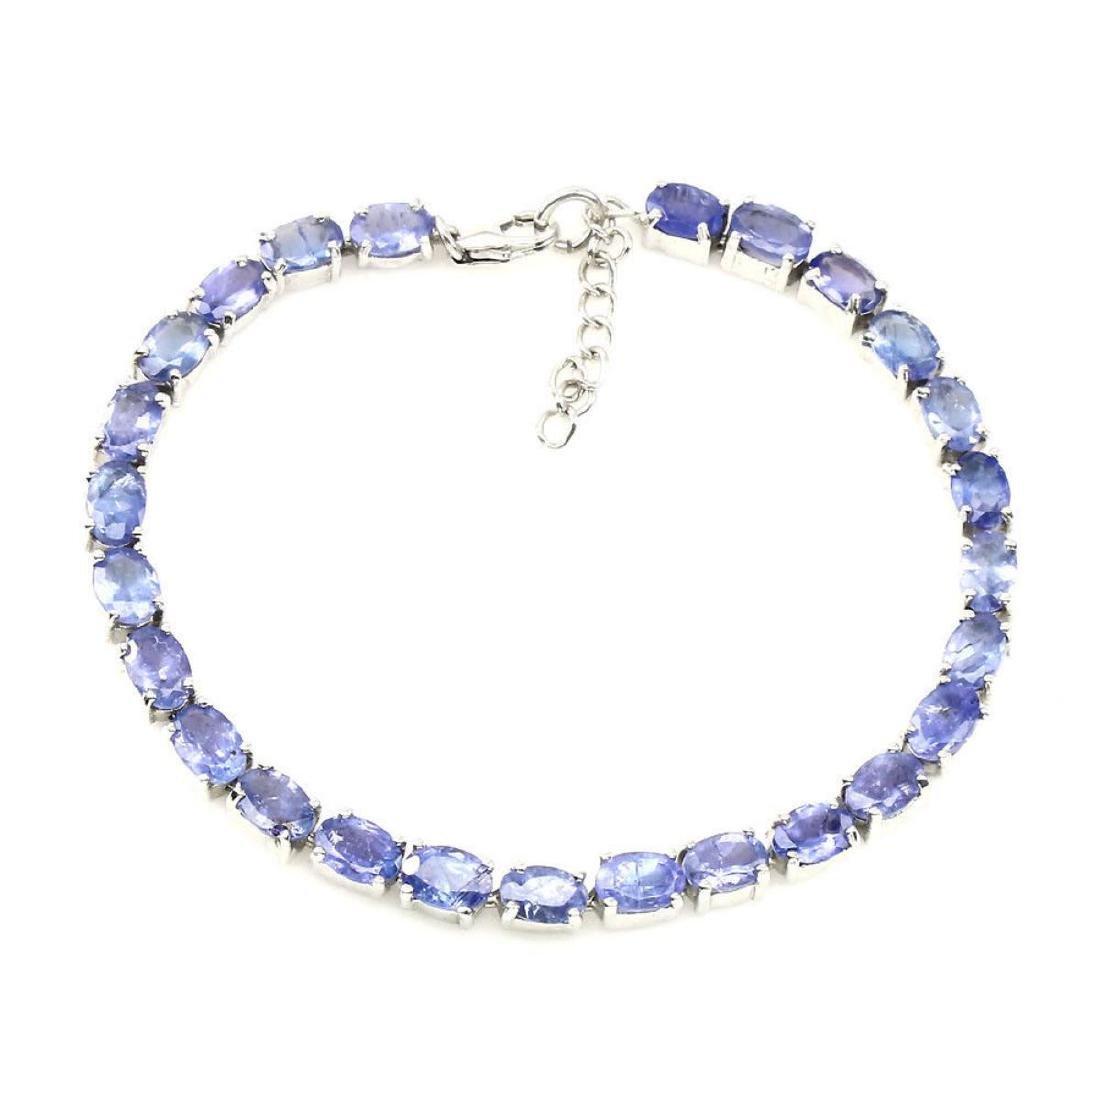 Natural  Blue Violet Tanzanite 55.17 ct  Bracelet - 2